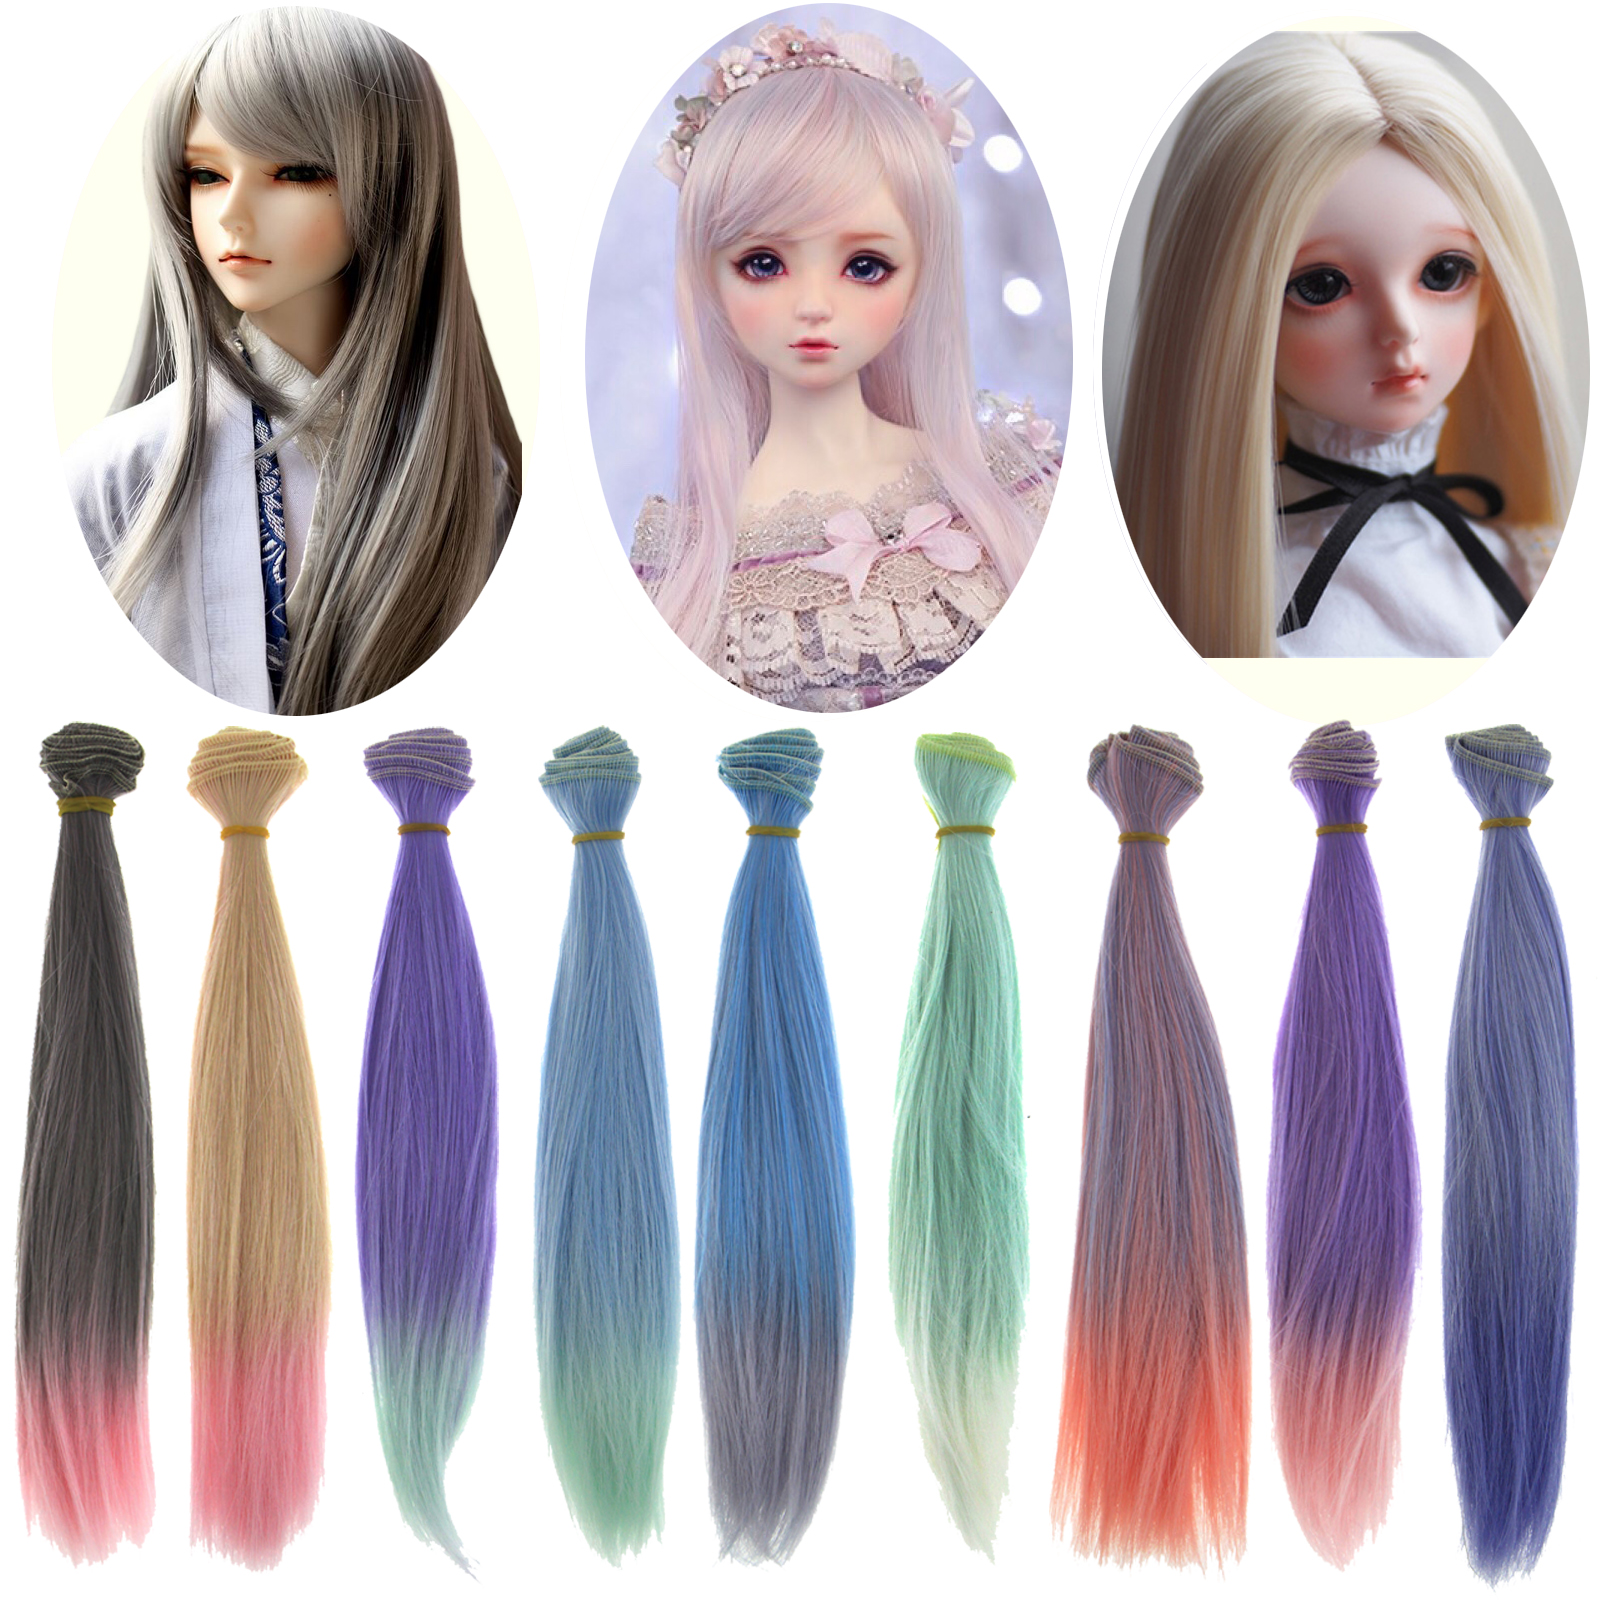 1 Pcs High Temperature Fiber 25 CM * 100 CM Gradual Color BJD Doll Wigs DIY Straight Hair For 1/12 1/6 Doll Accessories Toy